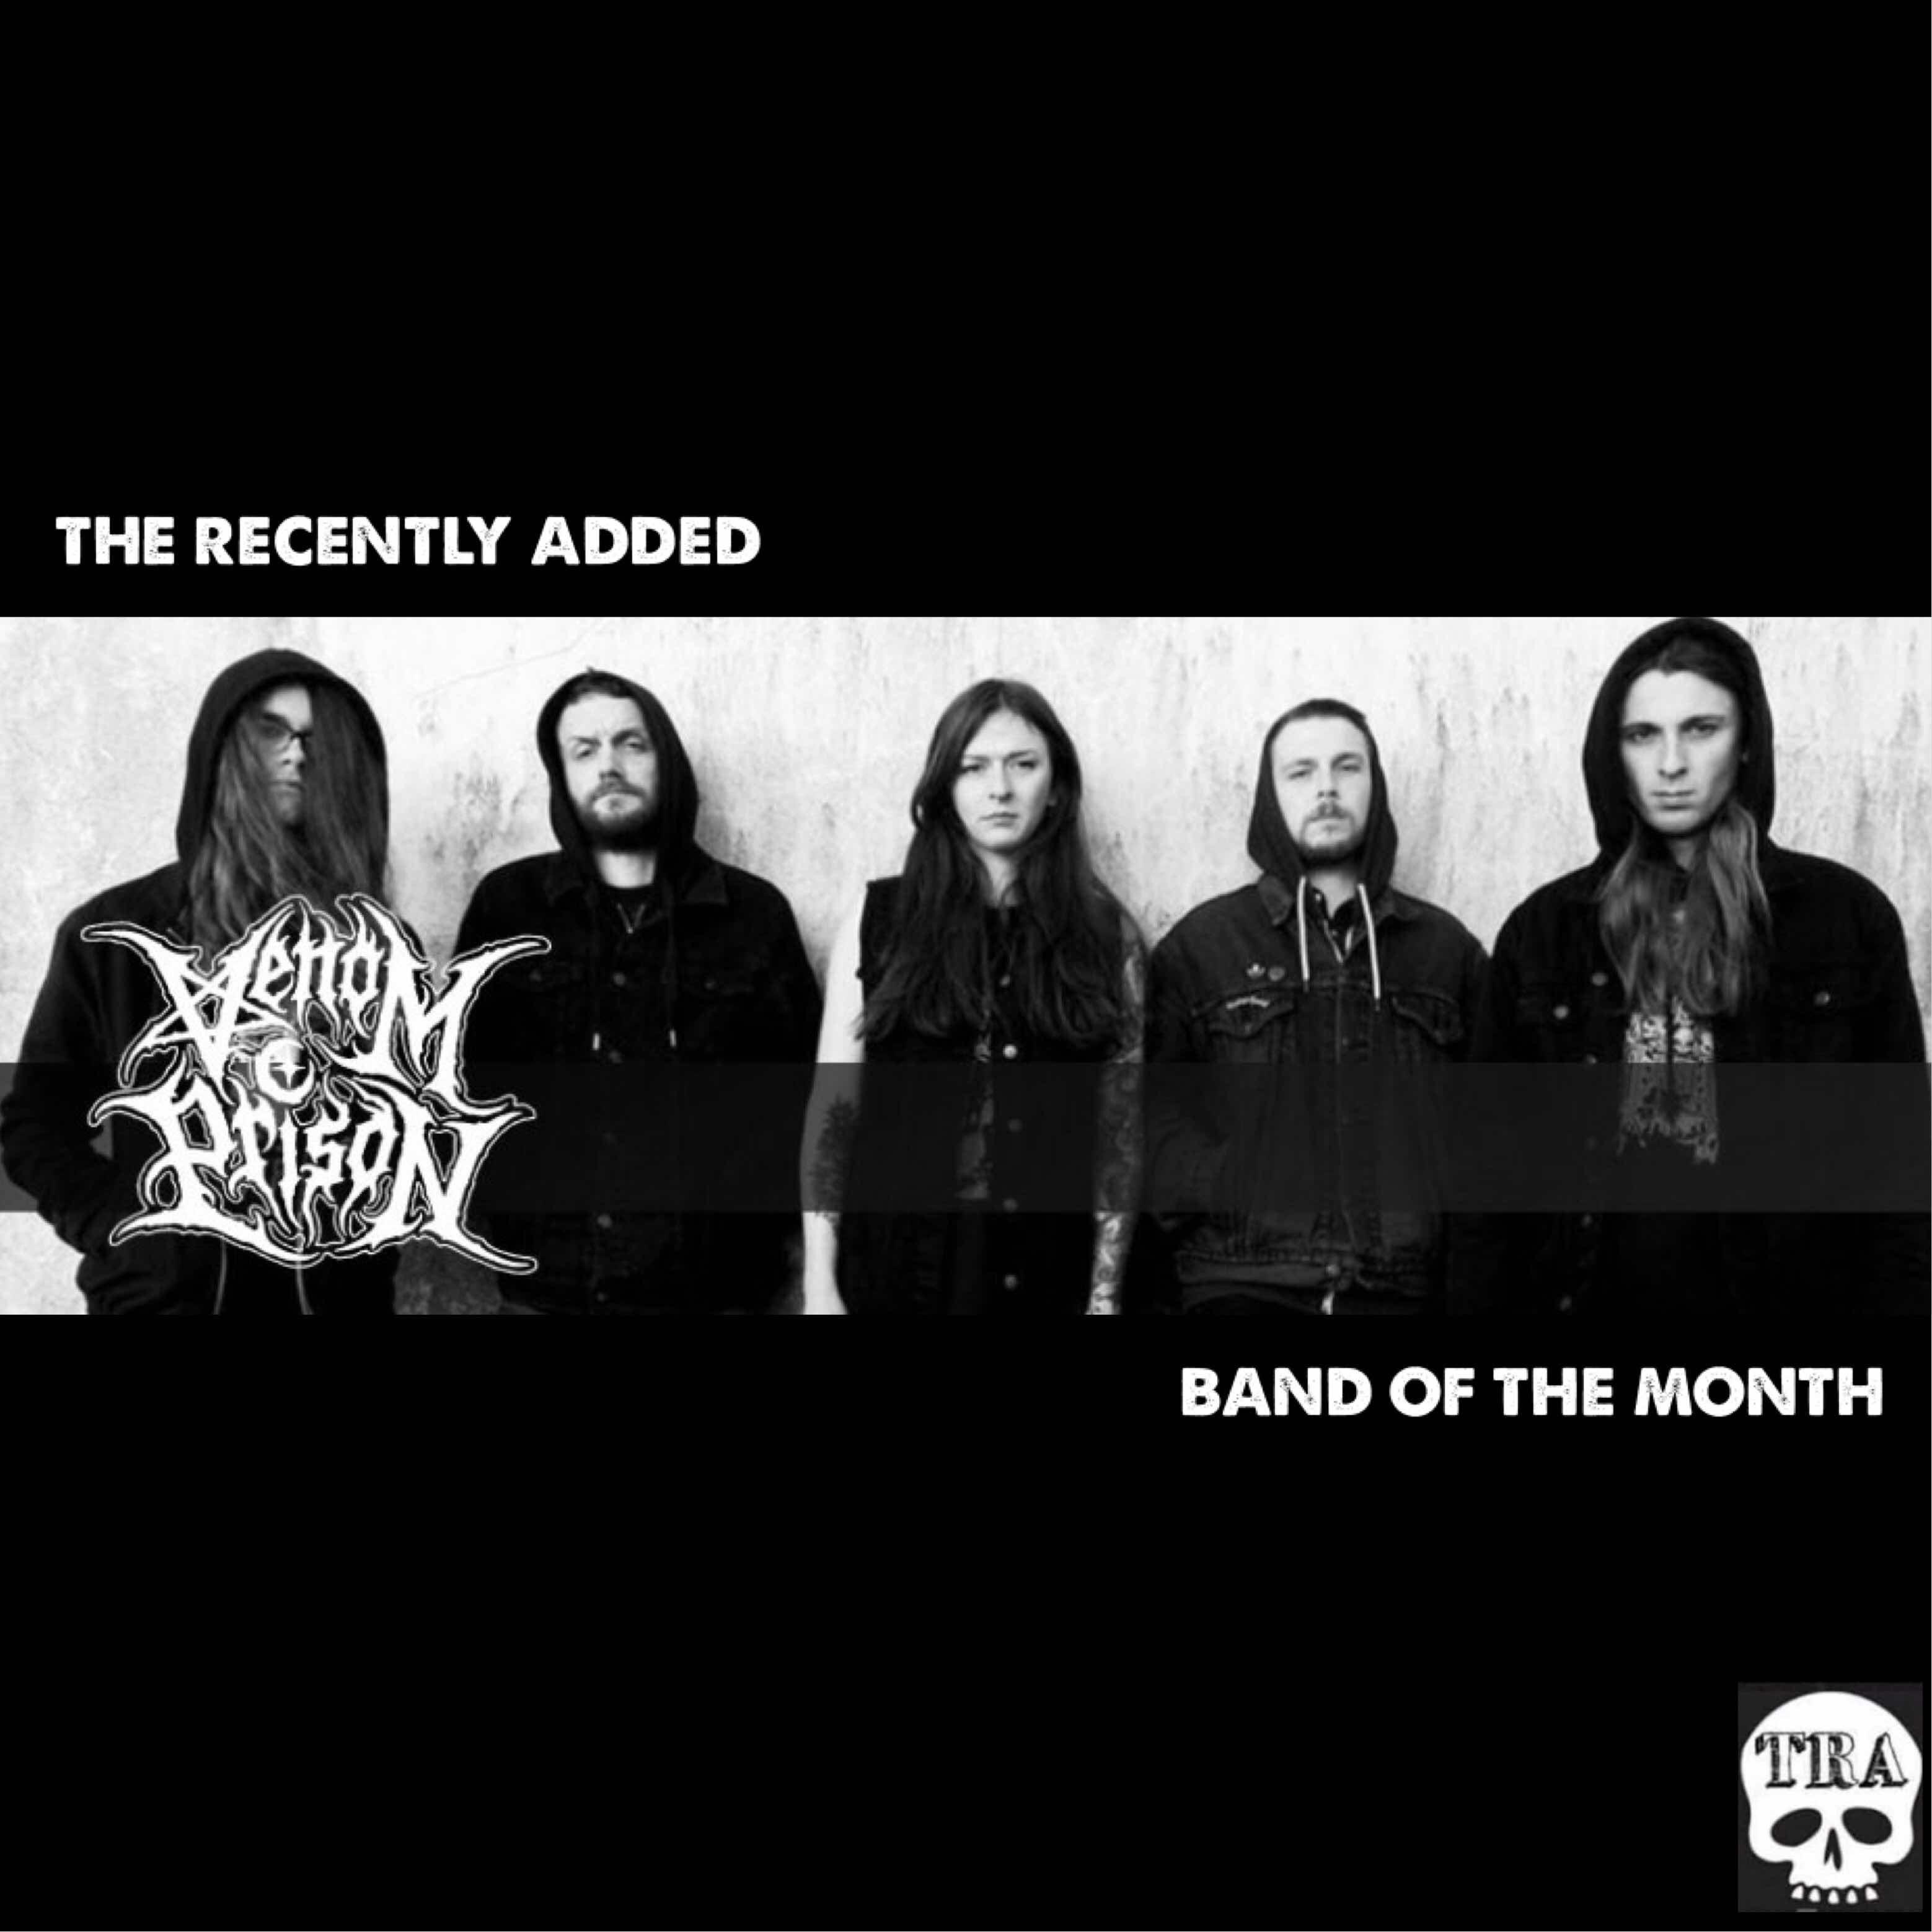 BOTM - October - Venom Prison